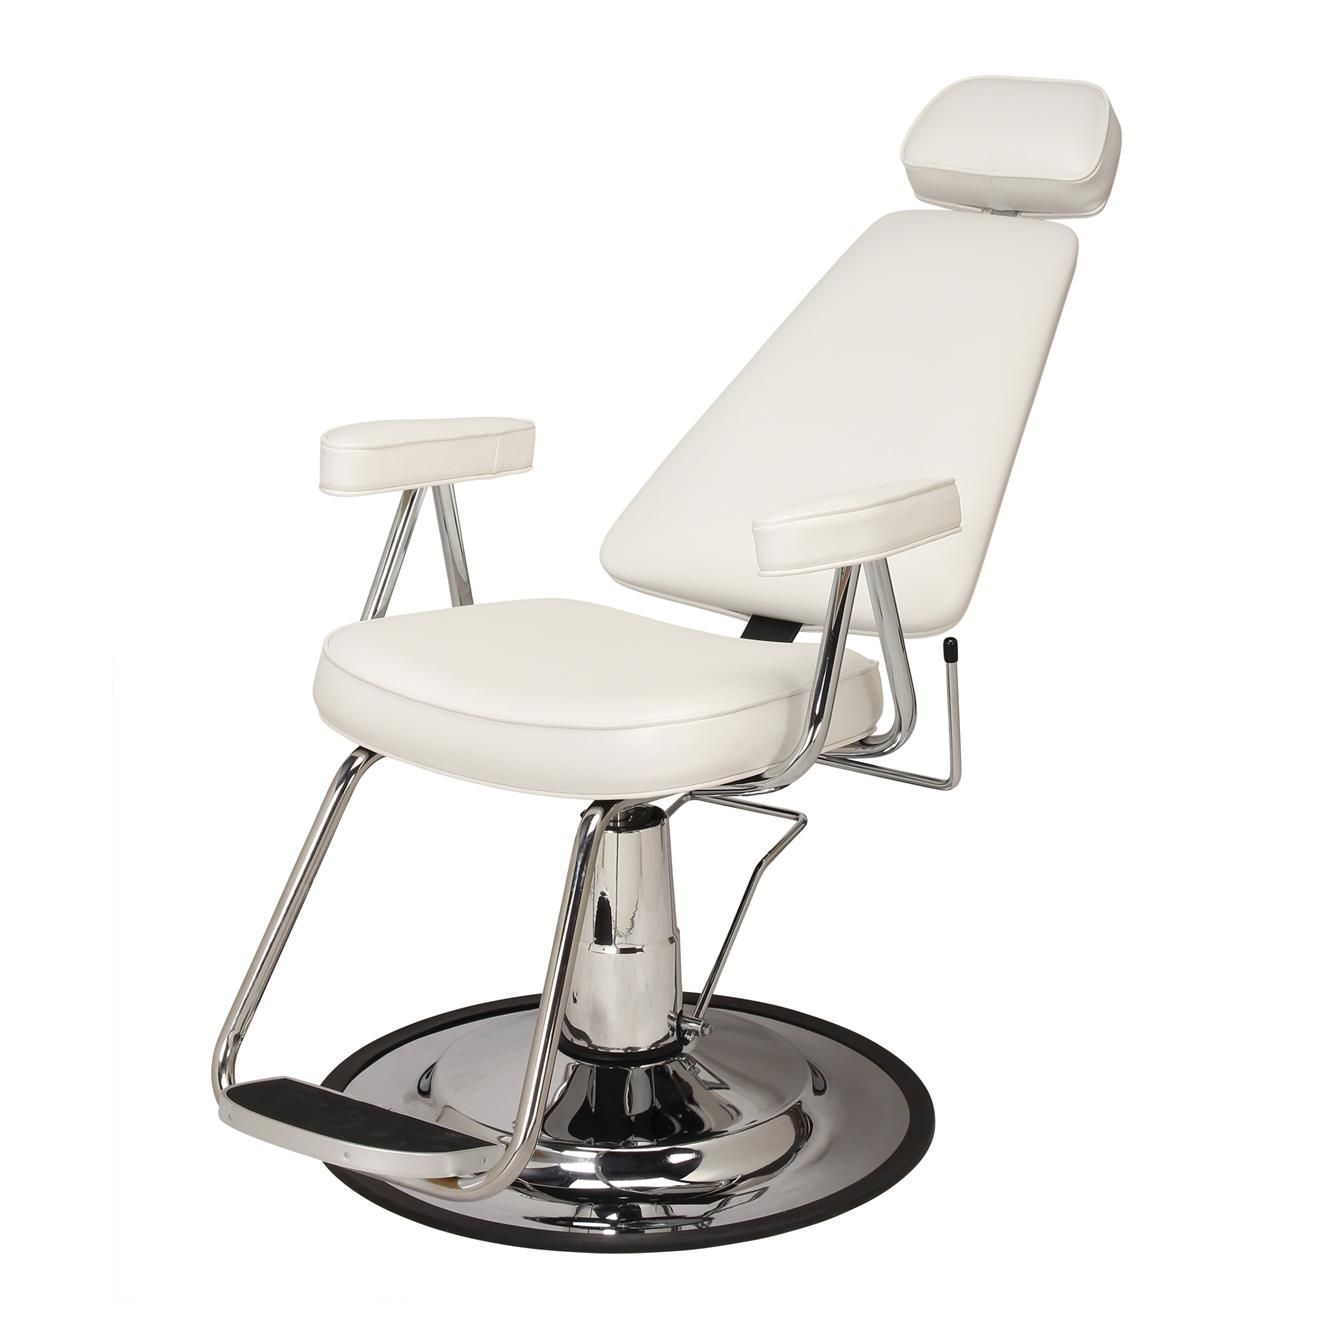 Pin On Salon Styling Chairs